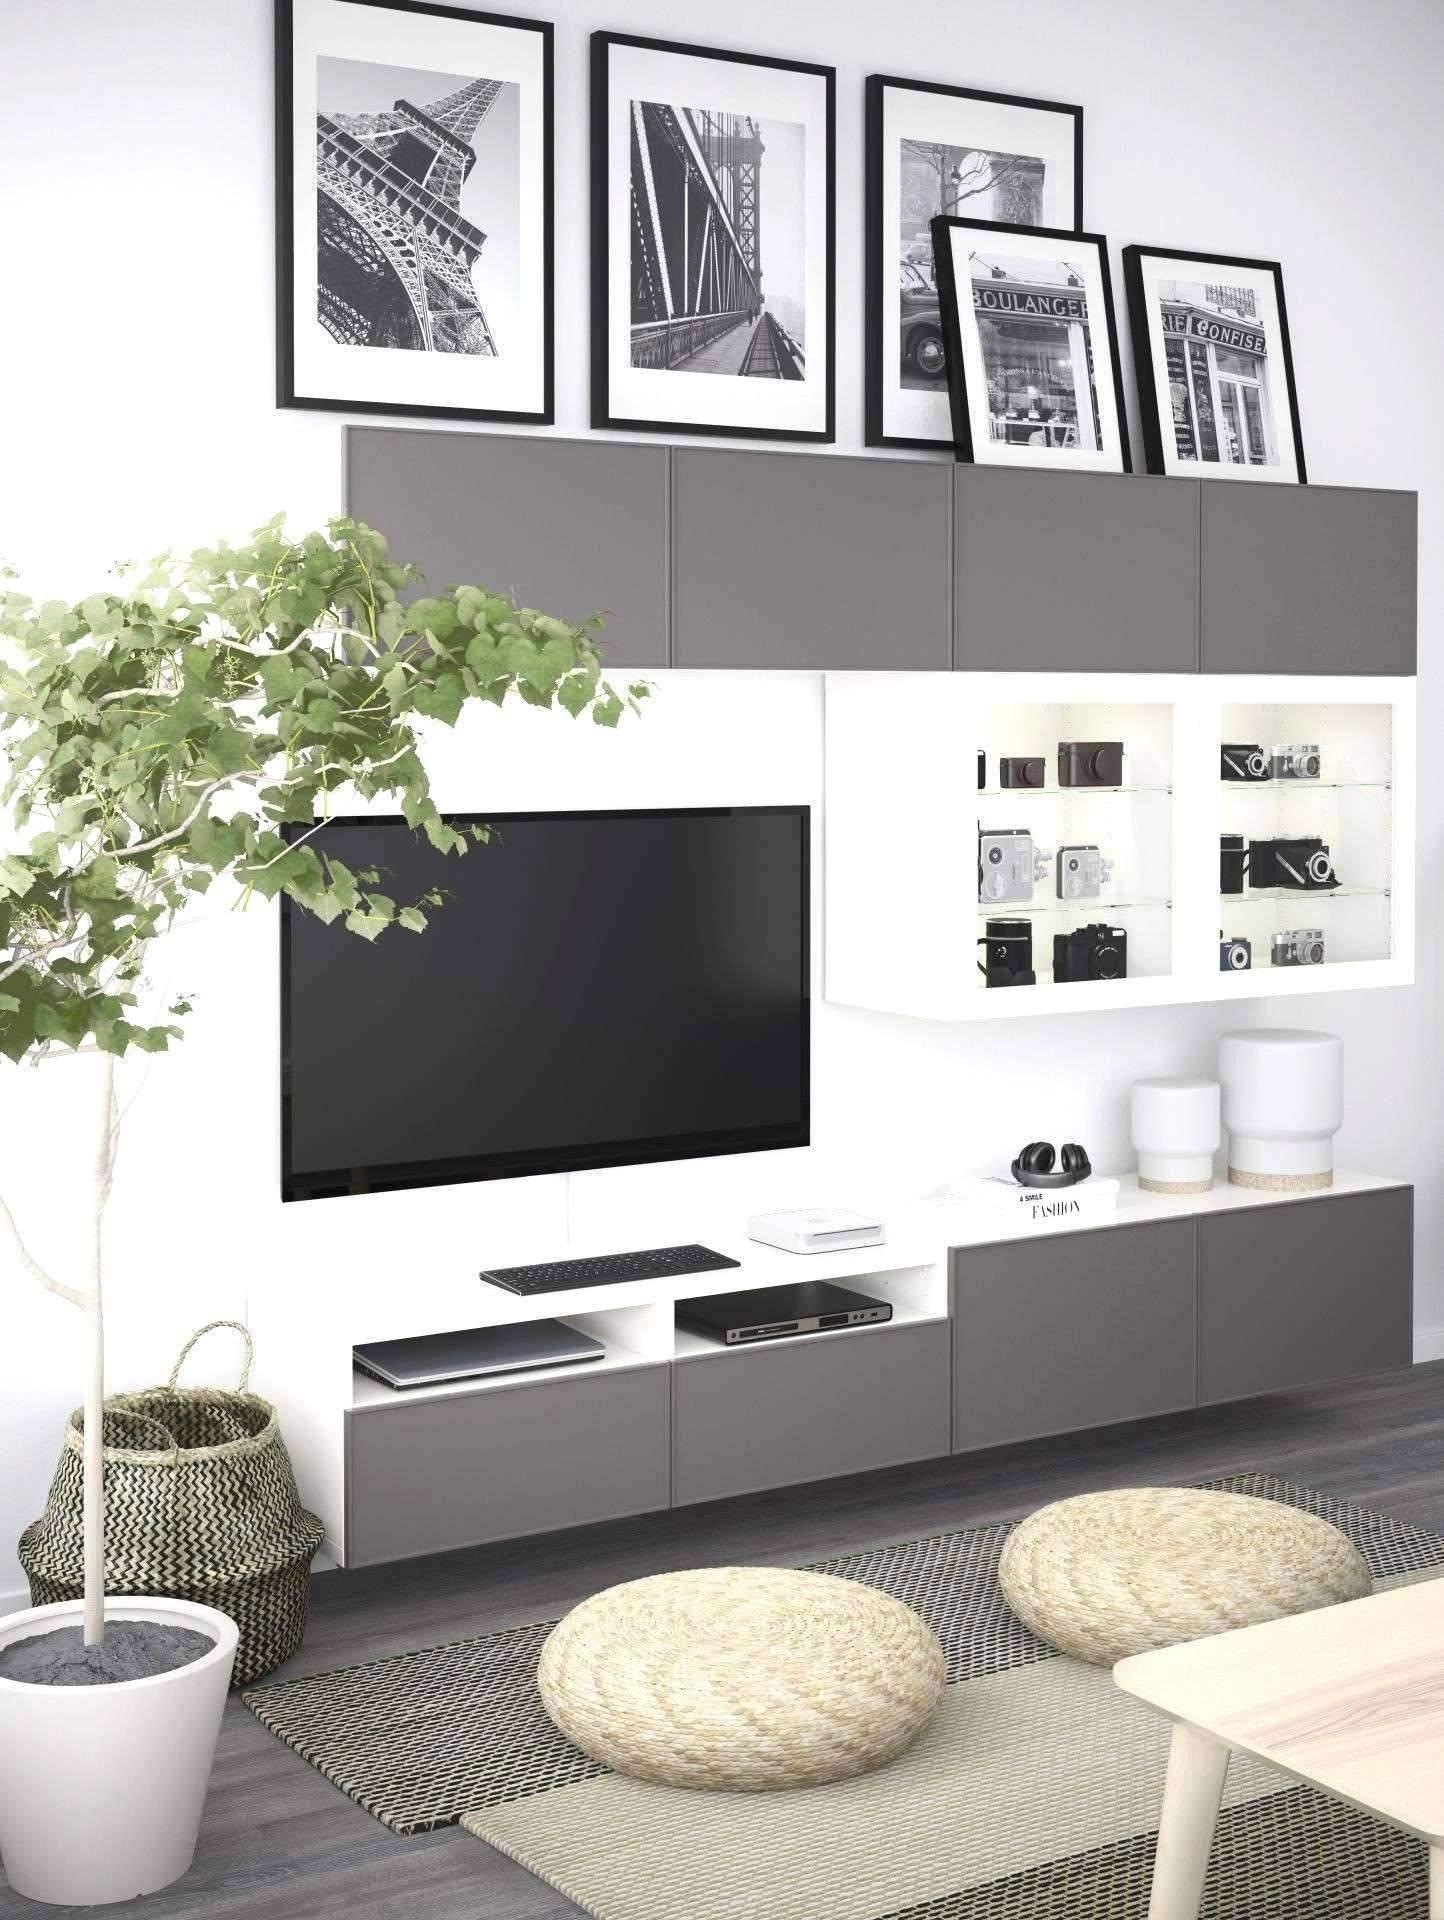 wohnzimmer ikea inspirierend inspiration wohnzimmer deko frisch wohnzimmer deko schon of wohnzimmer ikea